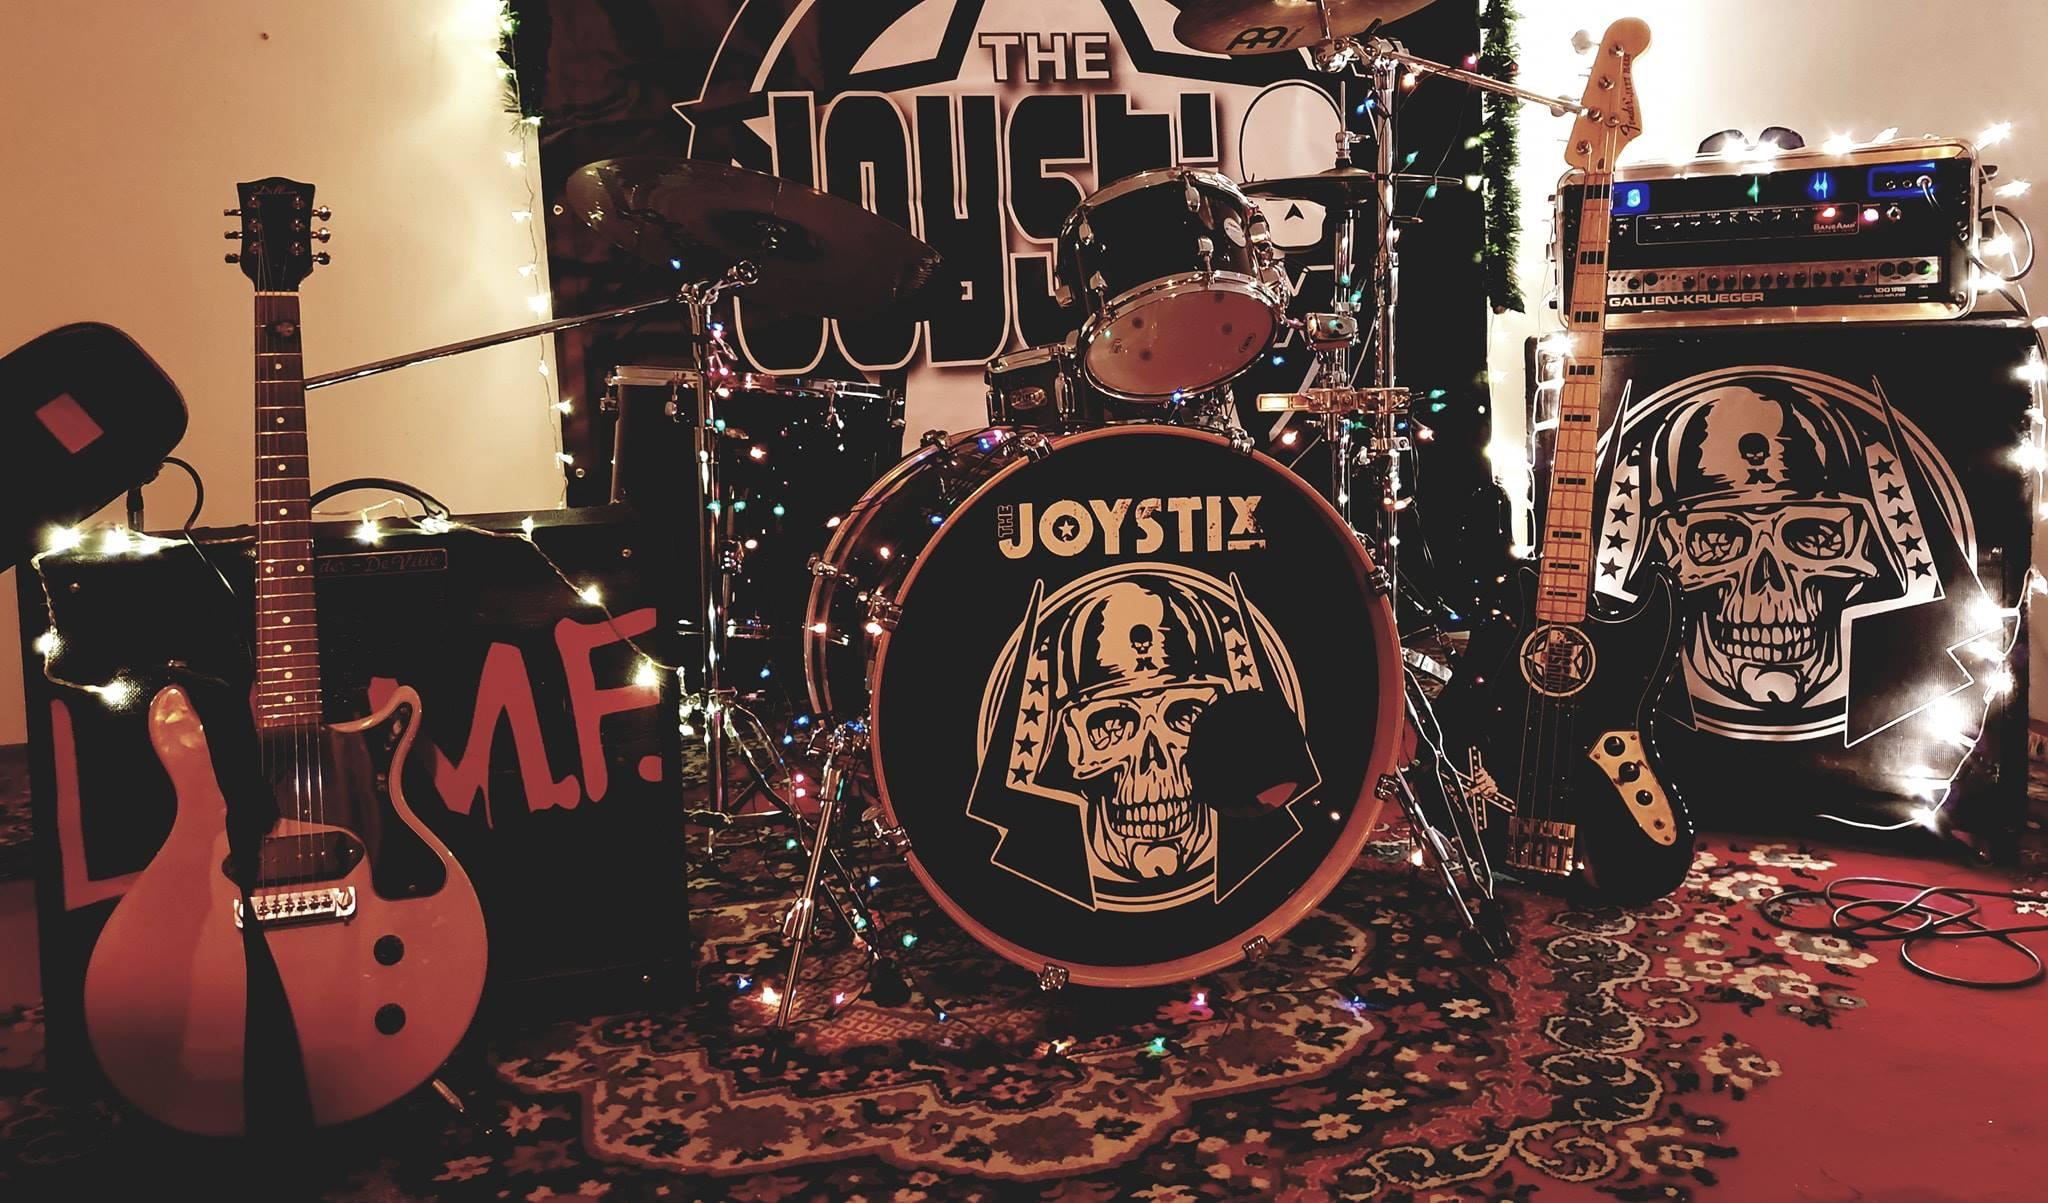 the_joystix_cover.jpg